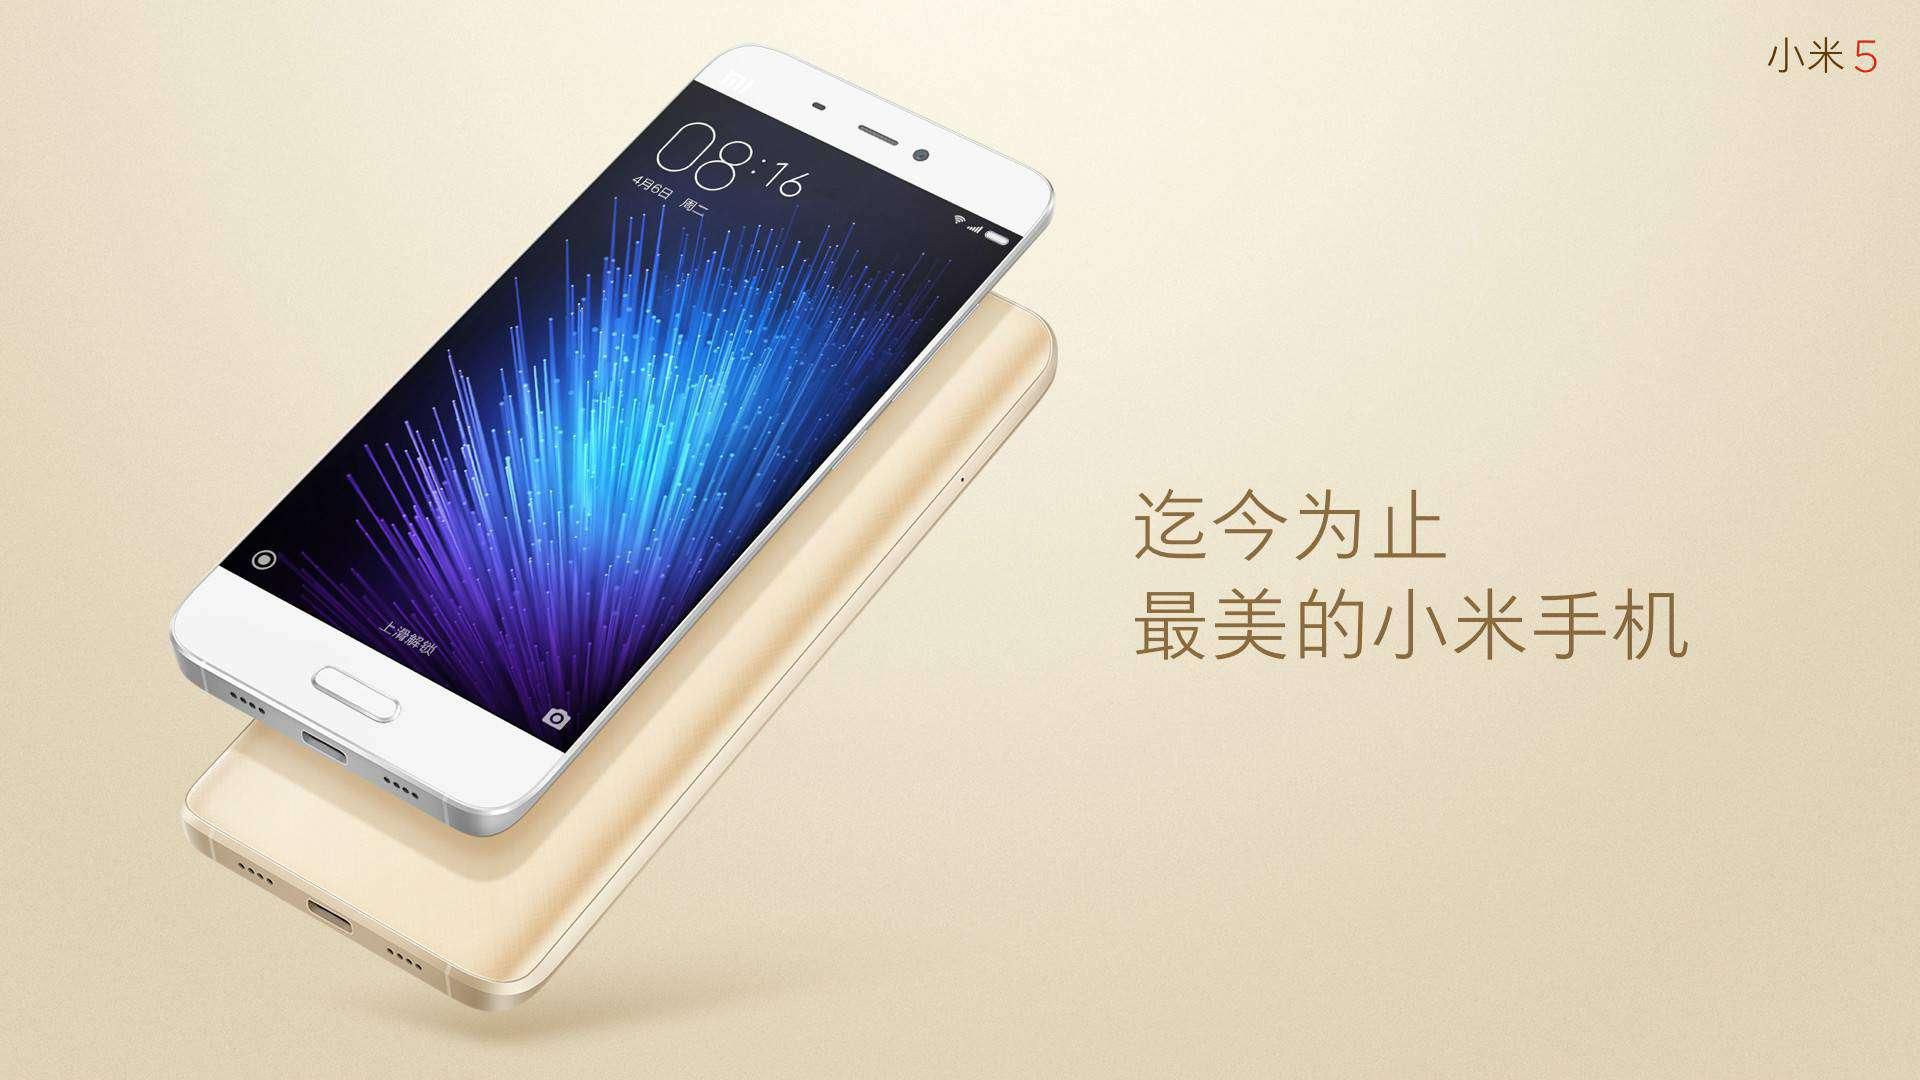 Xiaomi Mi 5 official image_2